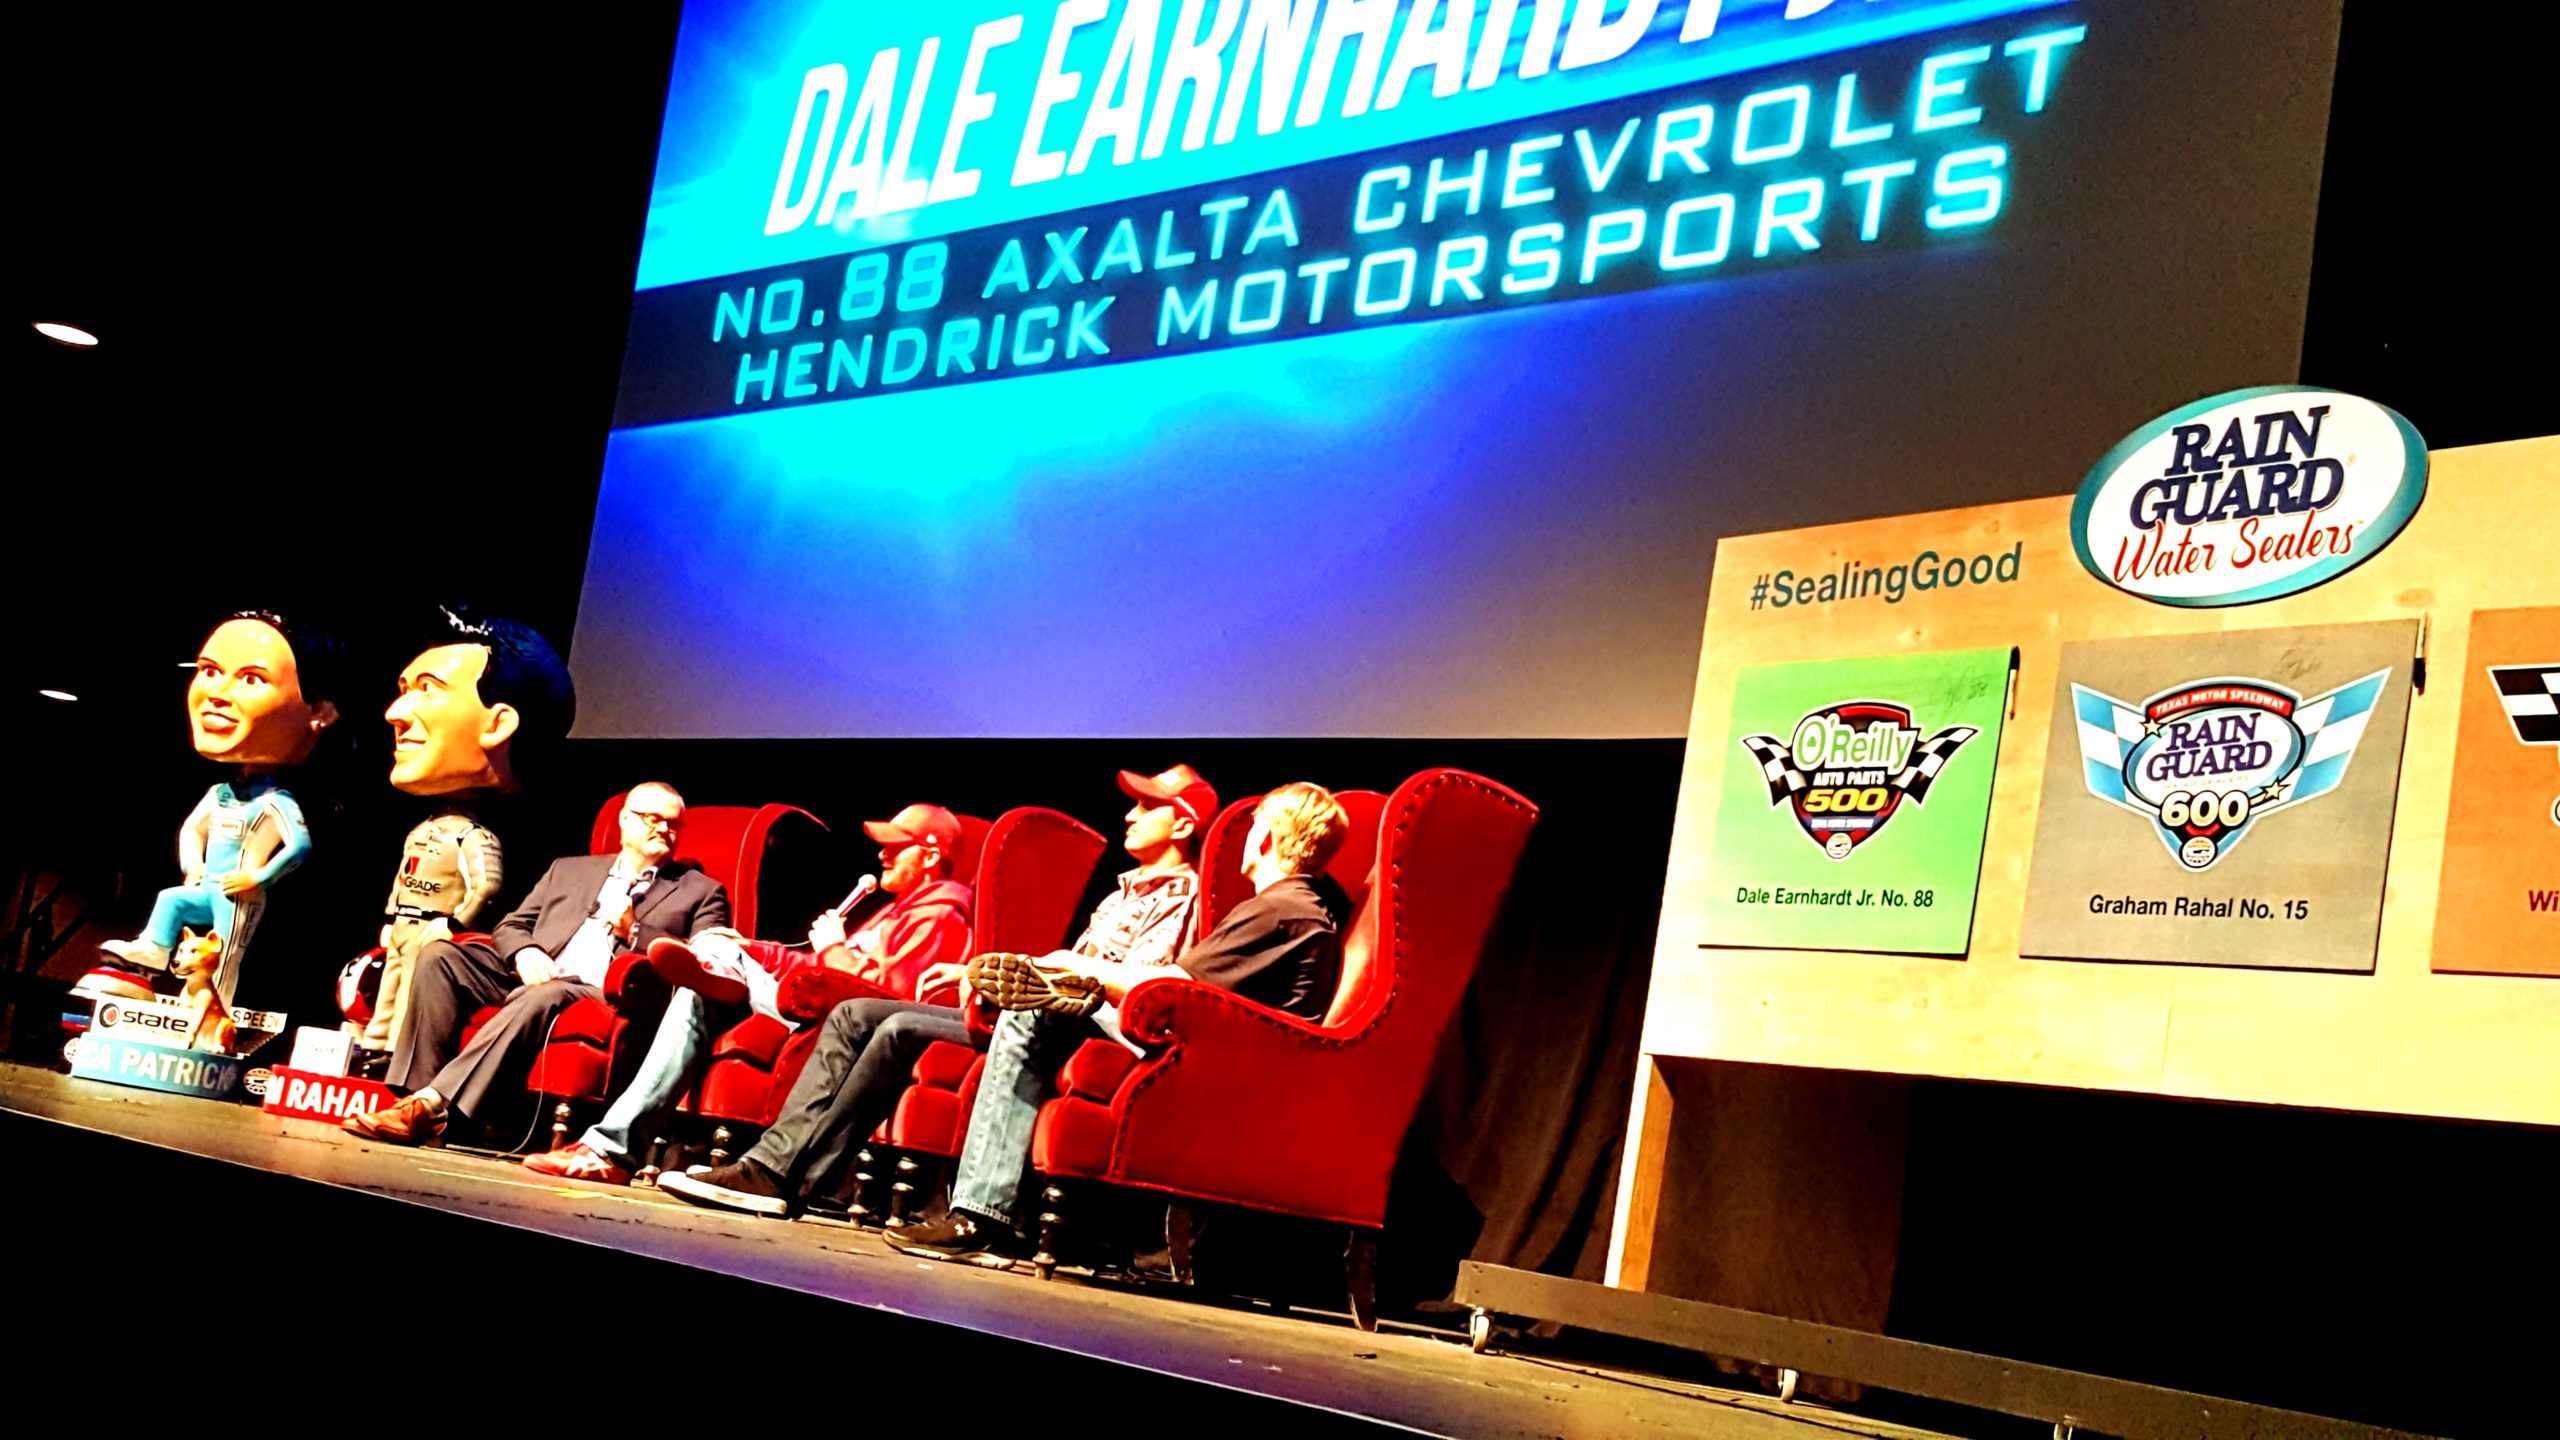 Dale Motorsports Marketing Rahal Rainguard